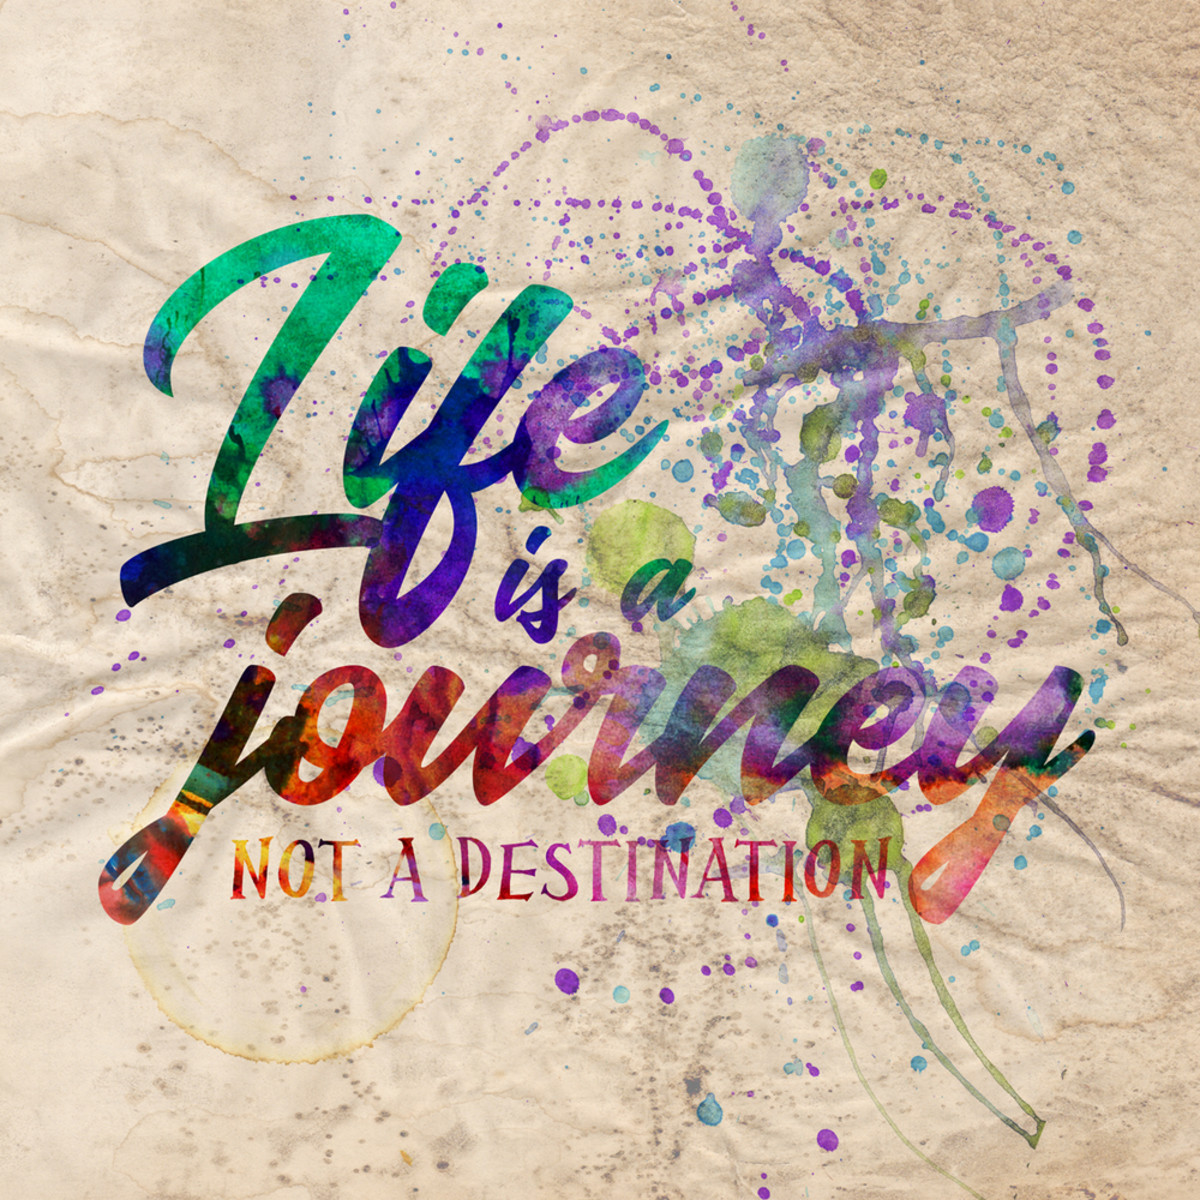 Life in a journey v2wgaq